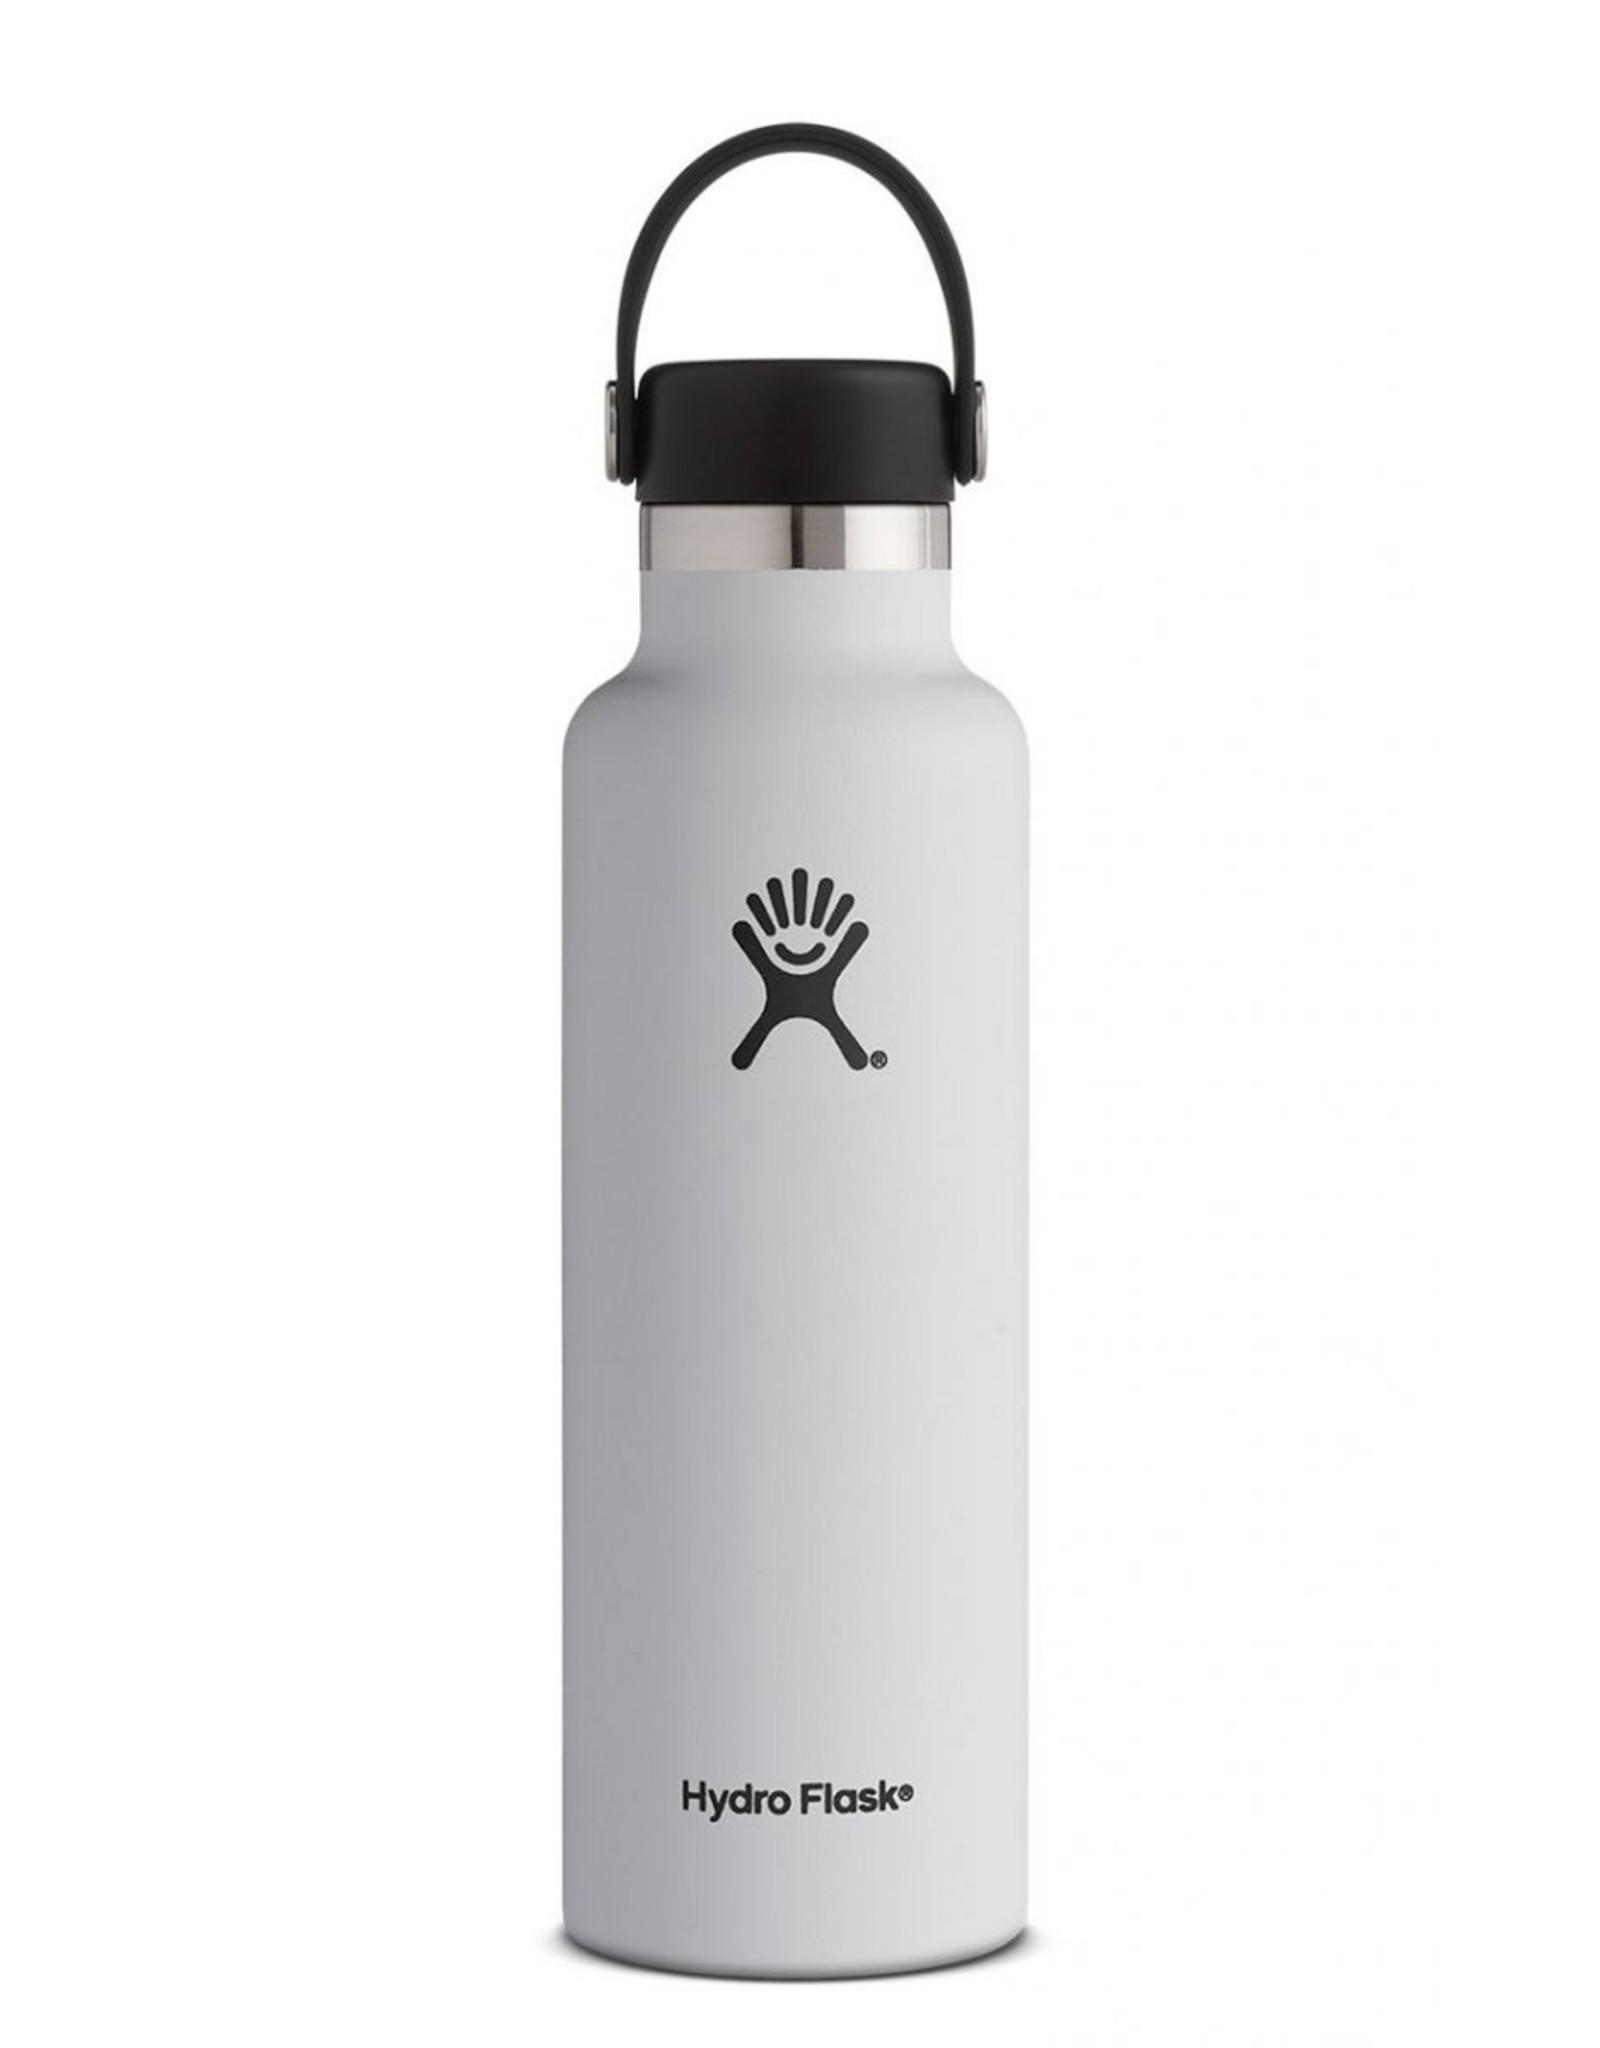 HYDRO FLASK HYDRO FLASK 21OZ STANDARD MOUTH BOTTLE-WHITE